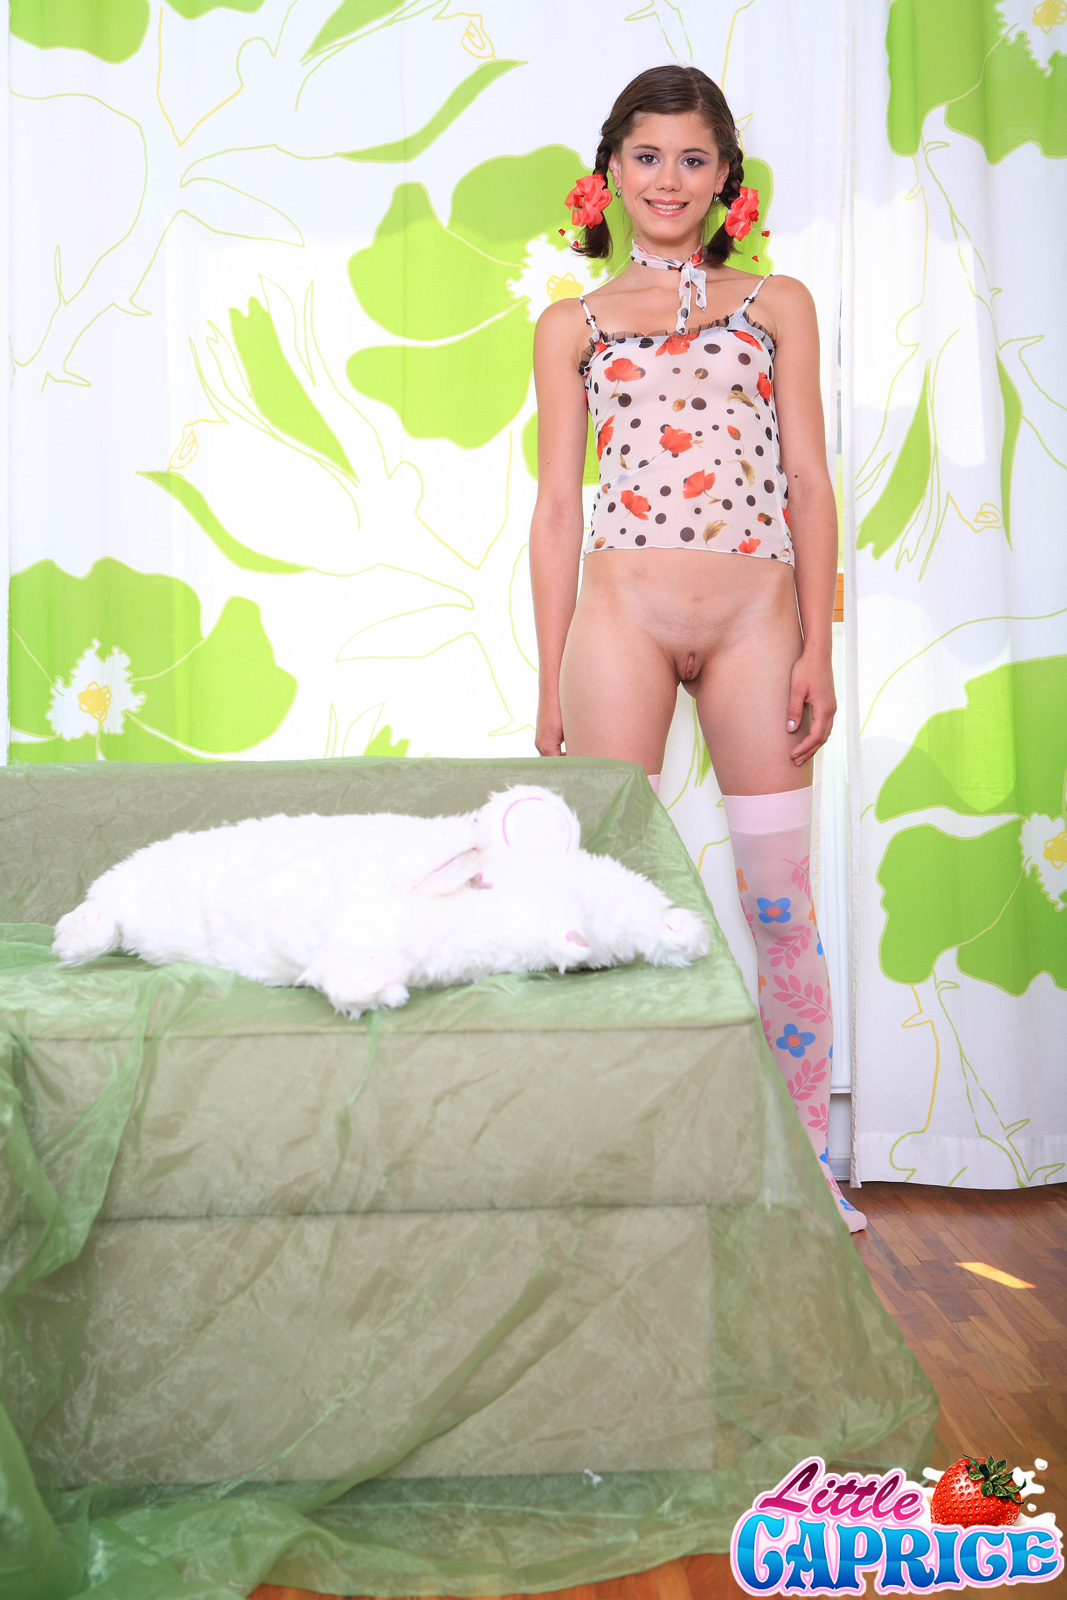 Ретро порно девушки с косичками брюнетка 22 фотография